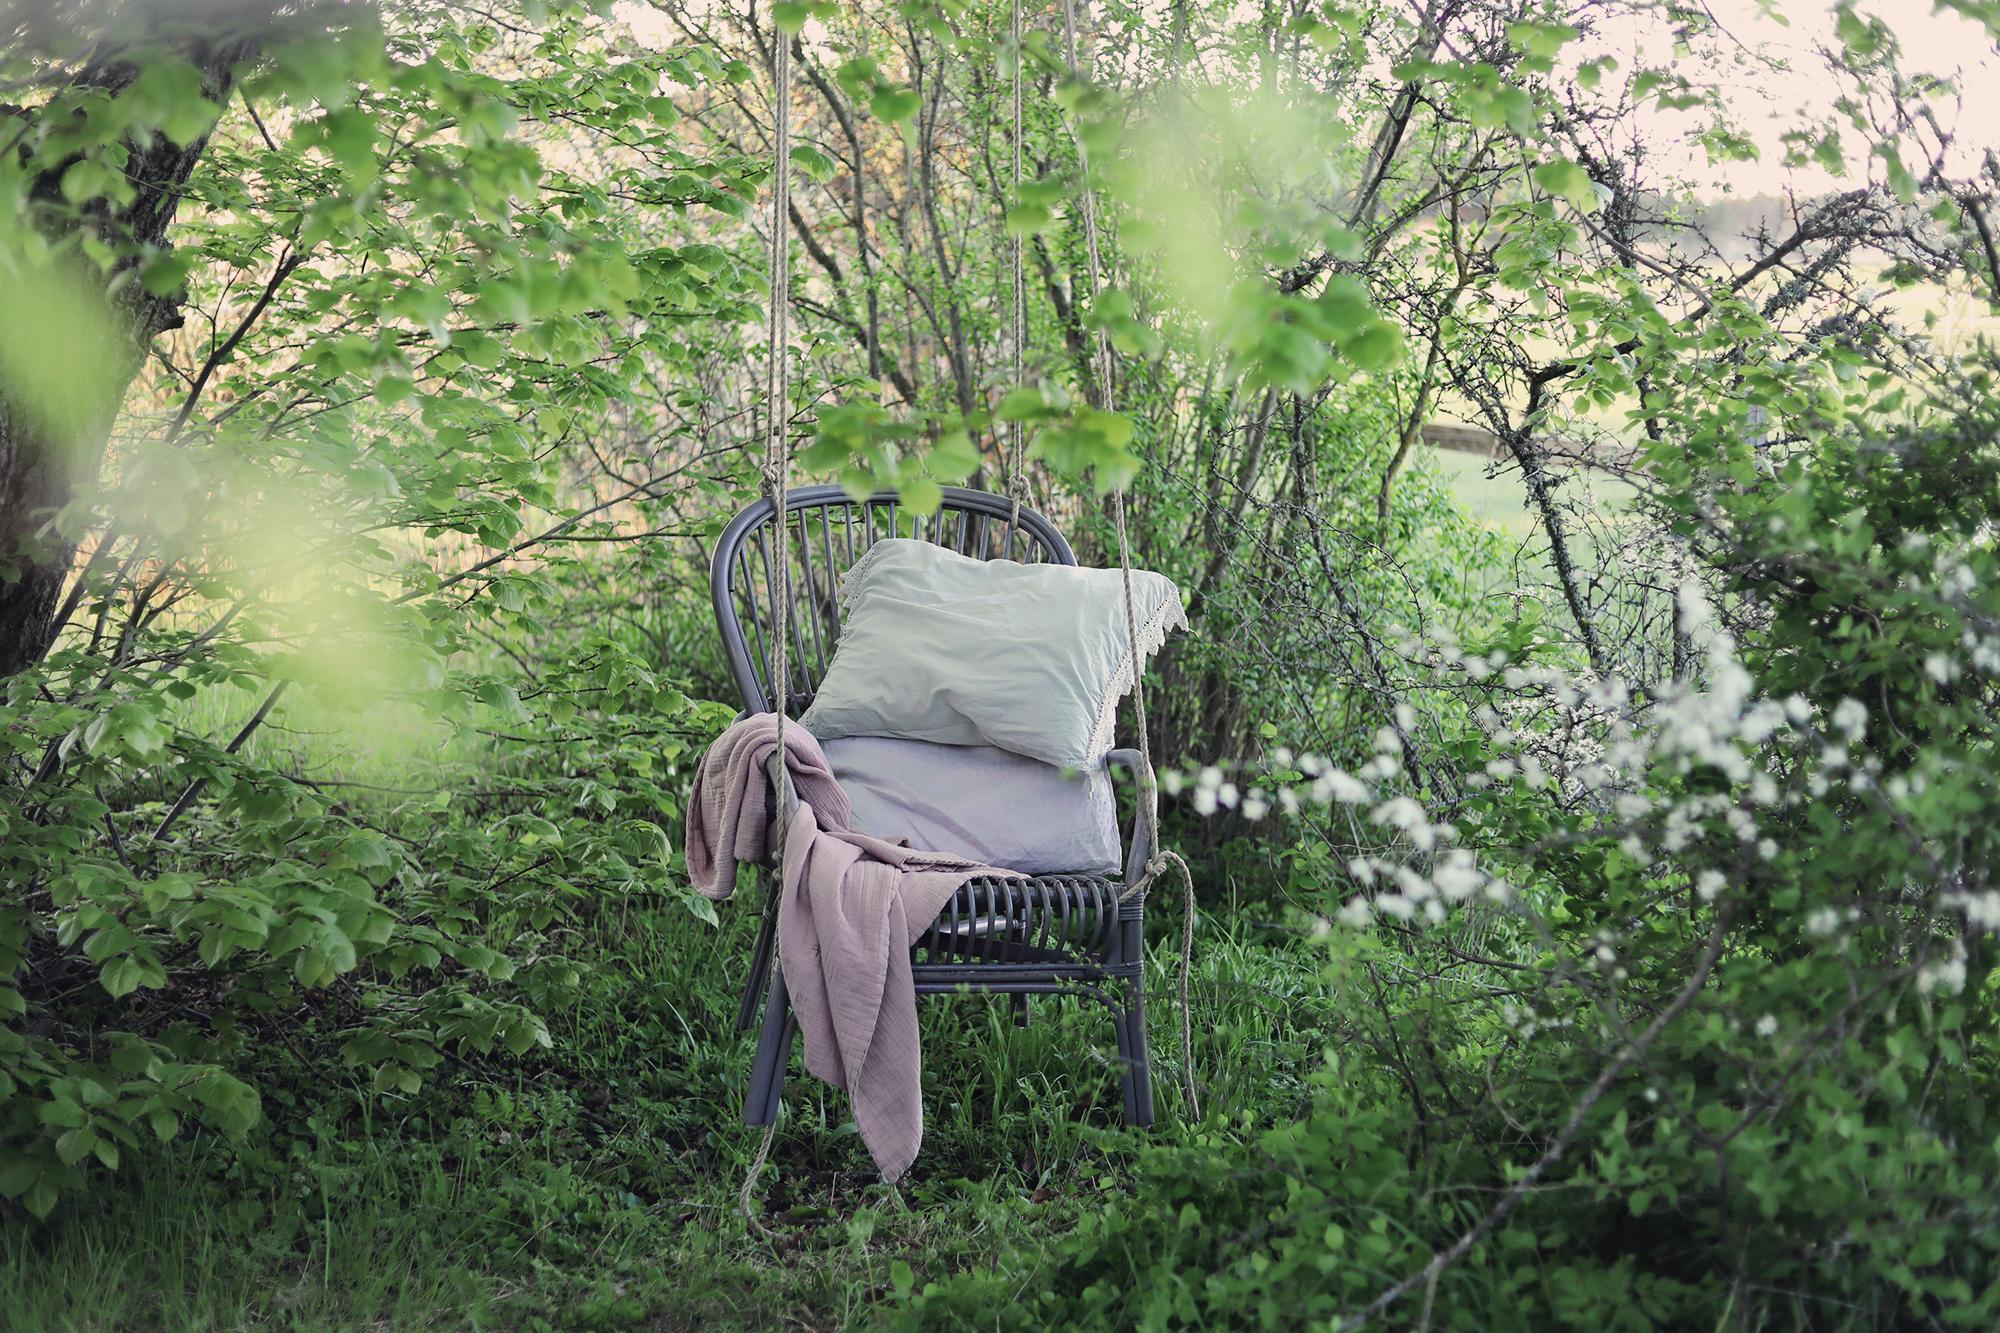 gunga stol DIY trädgård barn sommar